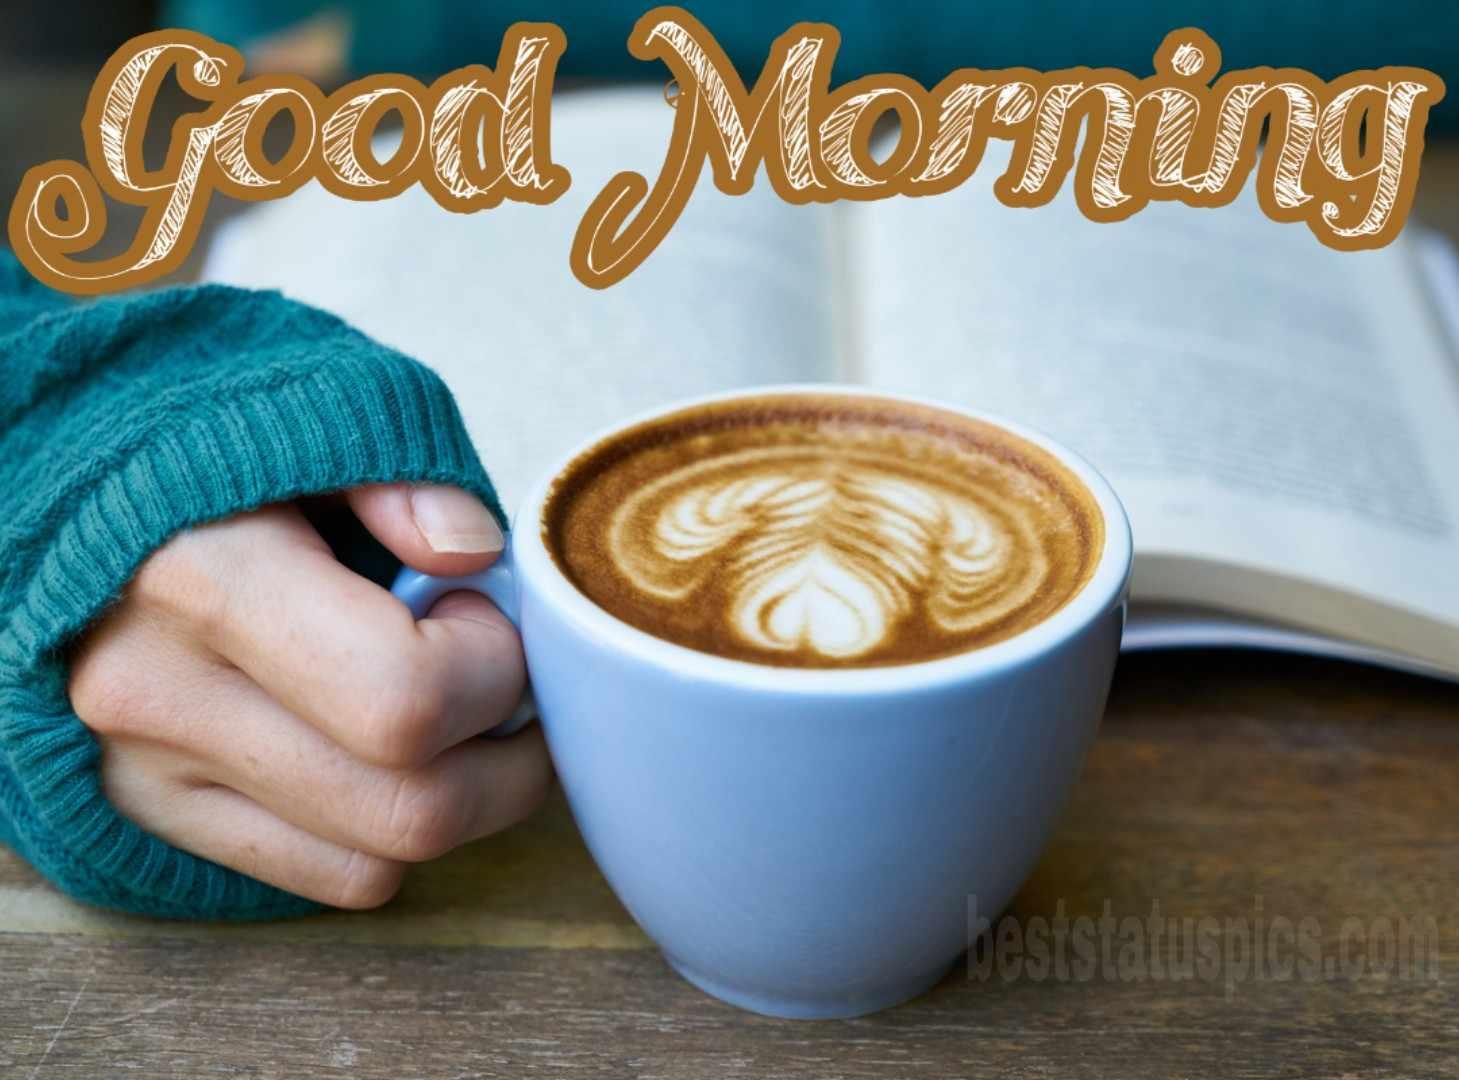 Good morning coffee mug with love for Whatsapp DP